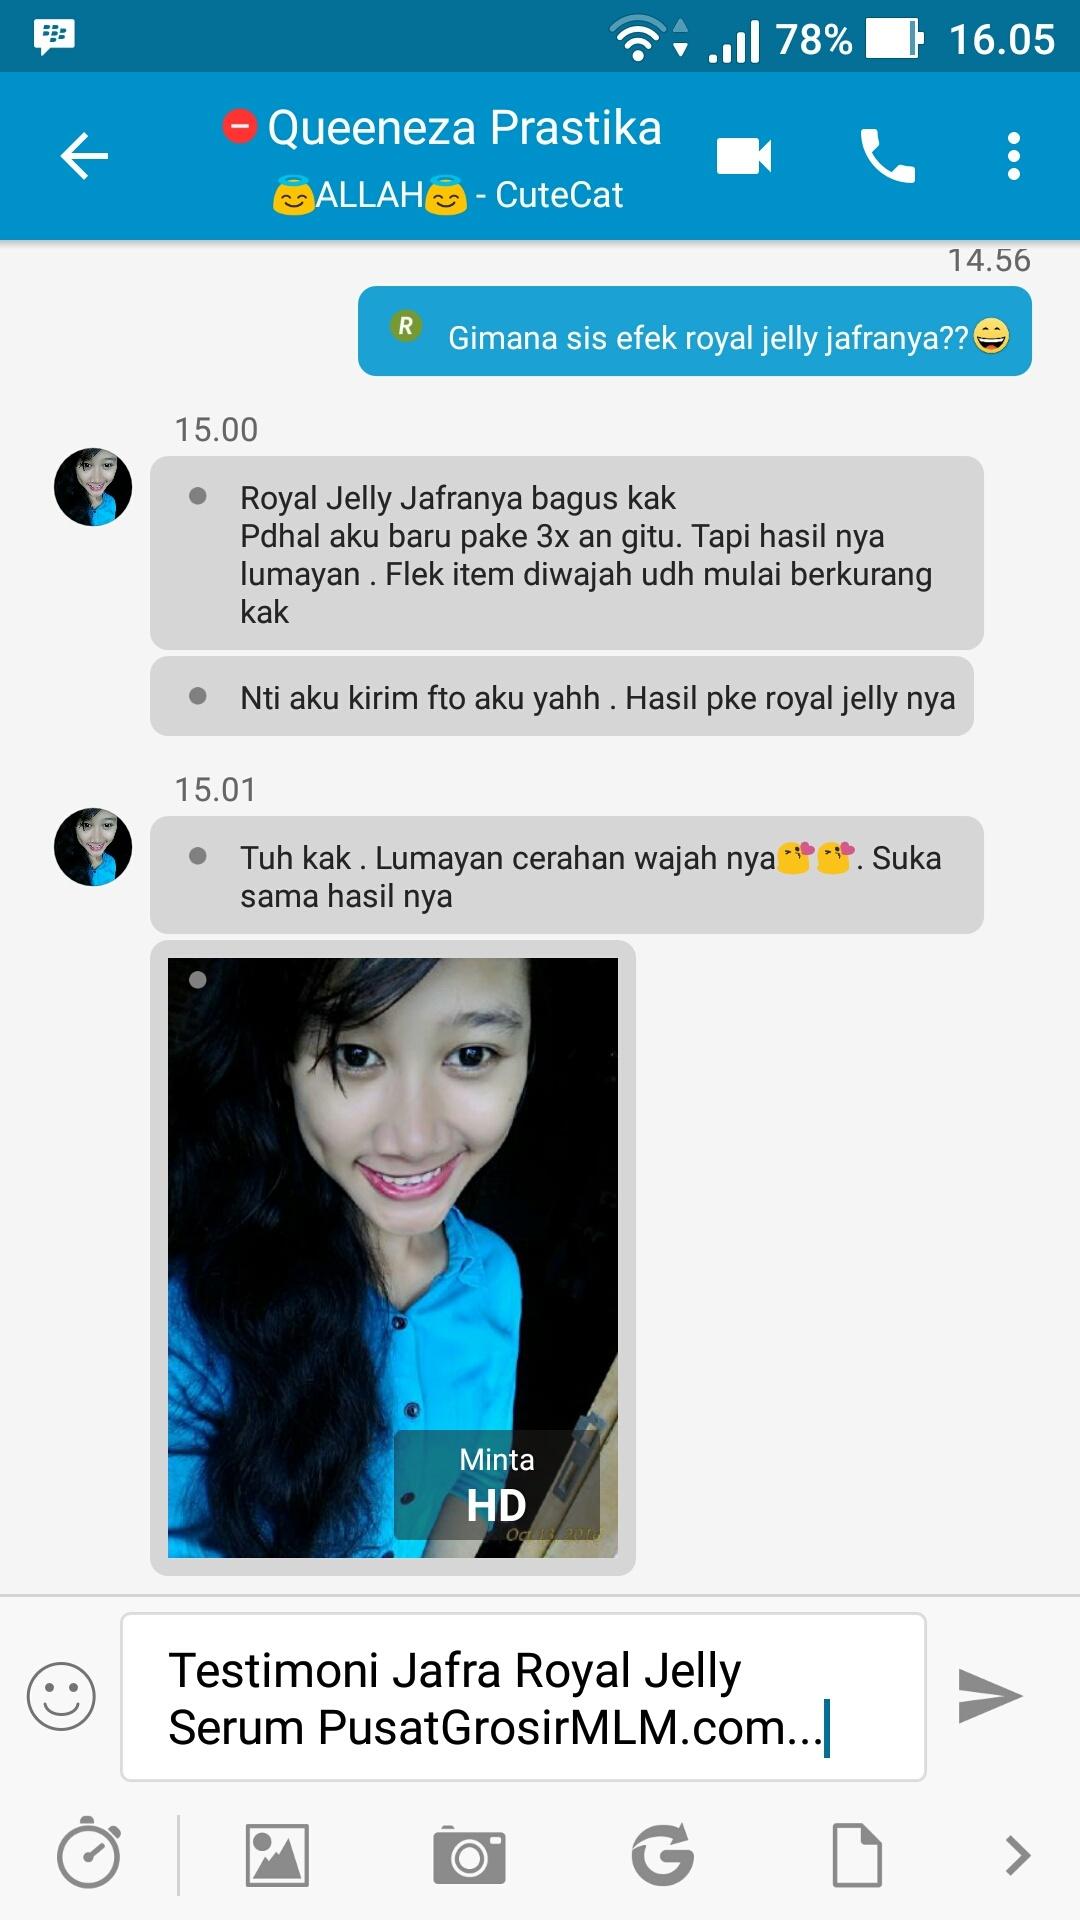 testimoni Jafra Royal Jelly Serum